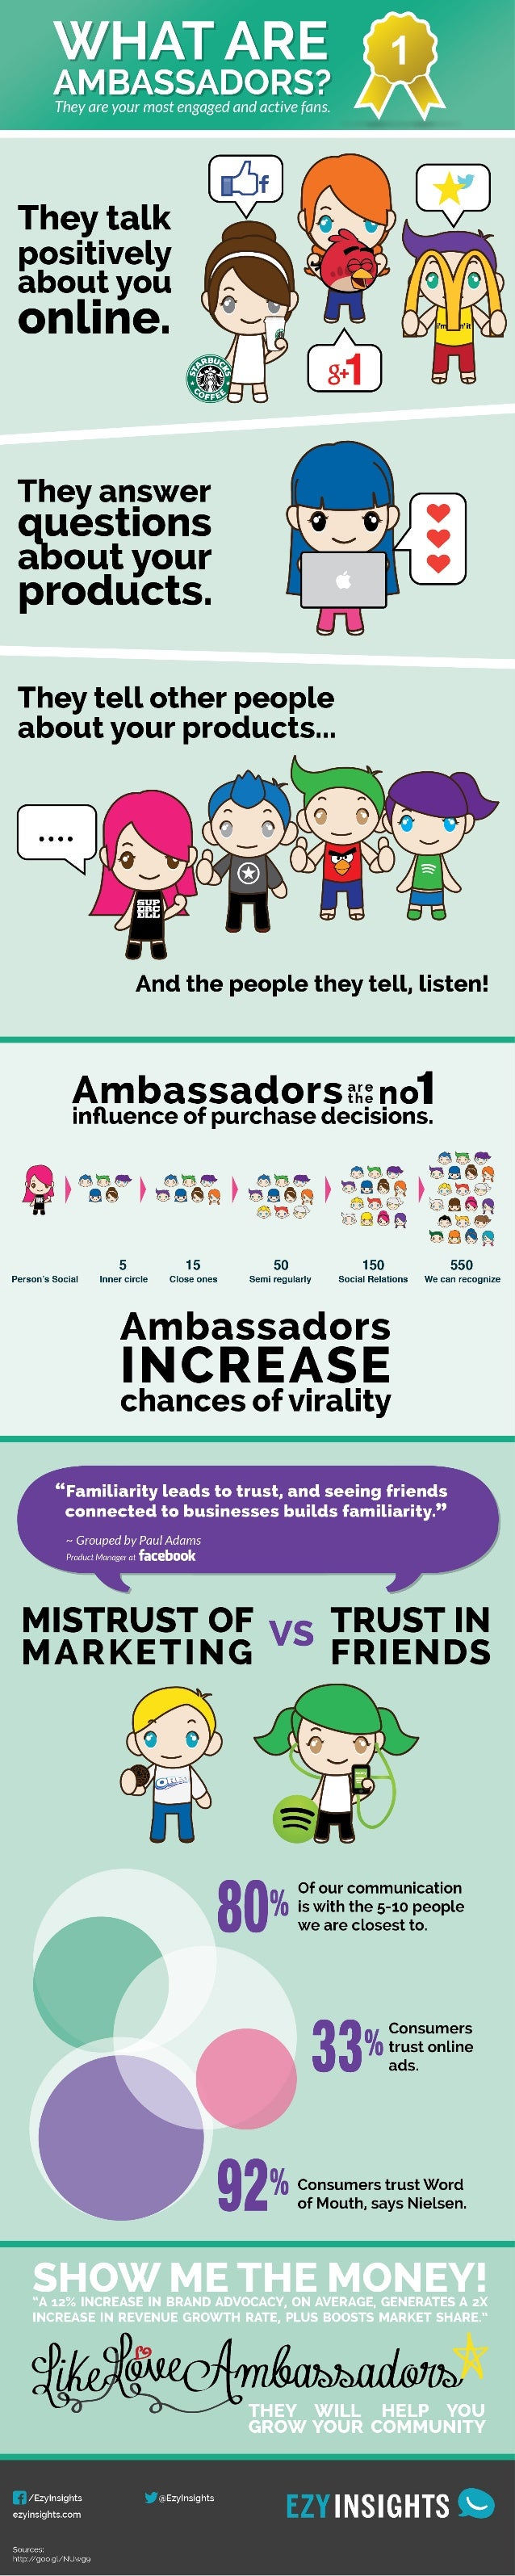 Social Media Ambassadors - Infographic